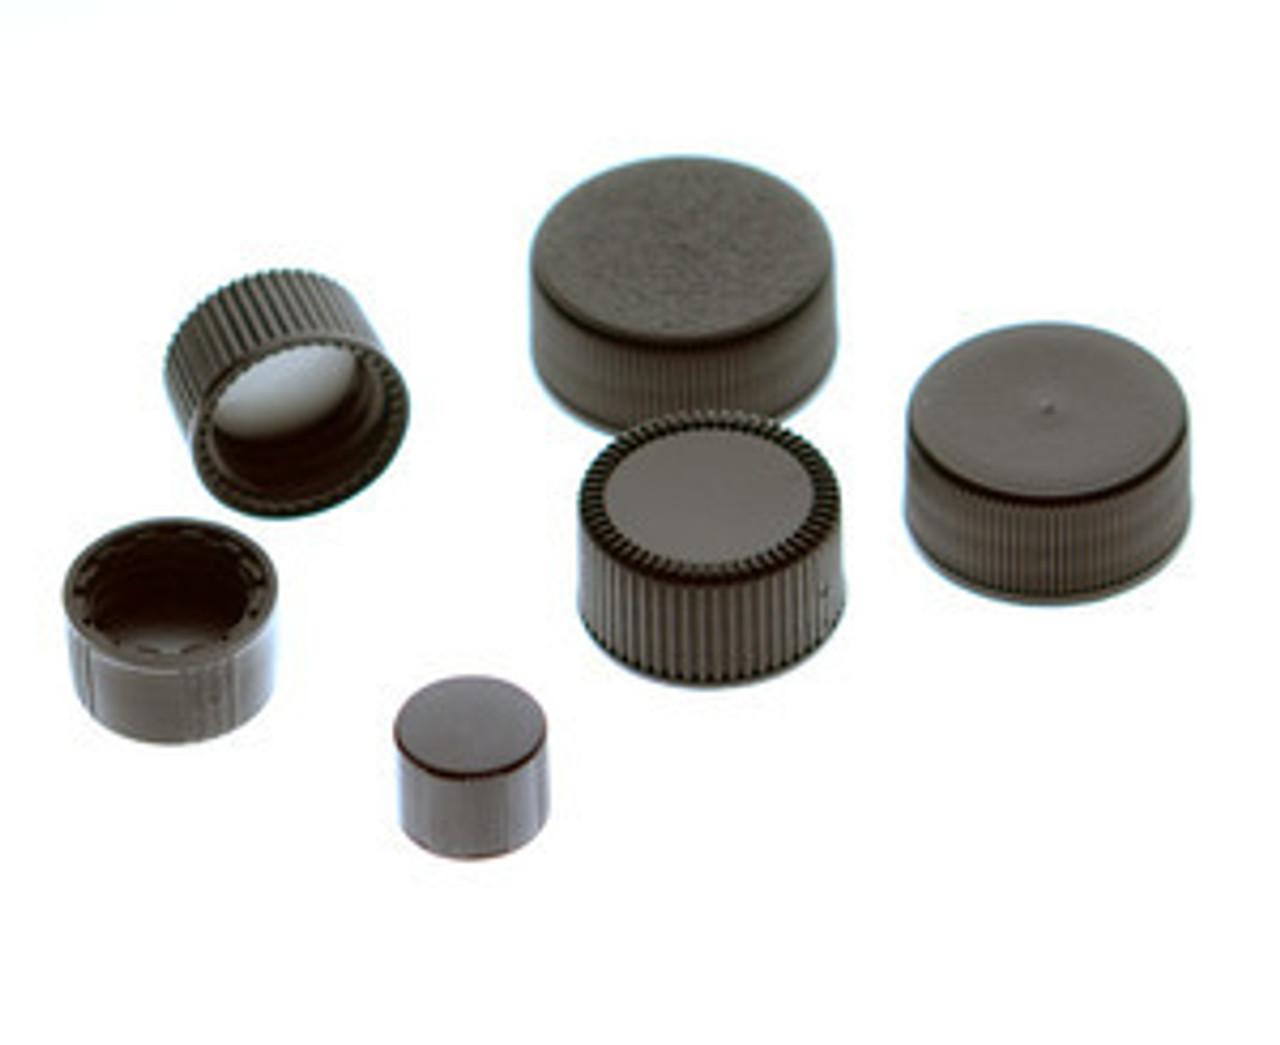 22-400 Foam Lined Caps